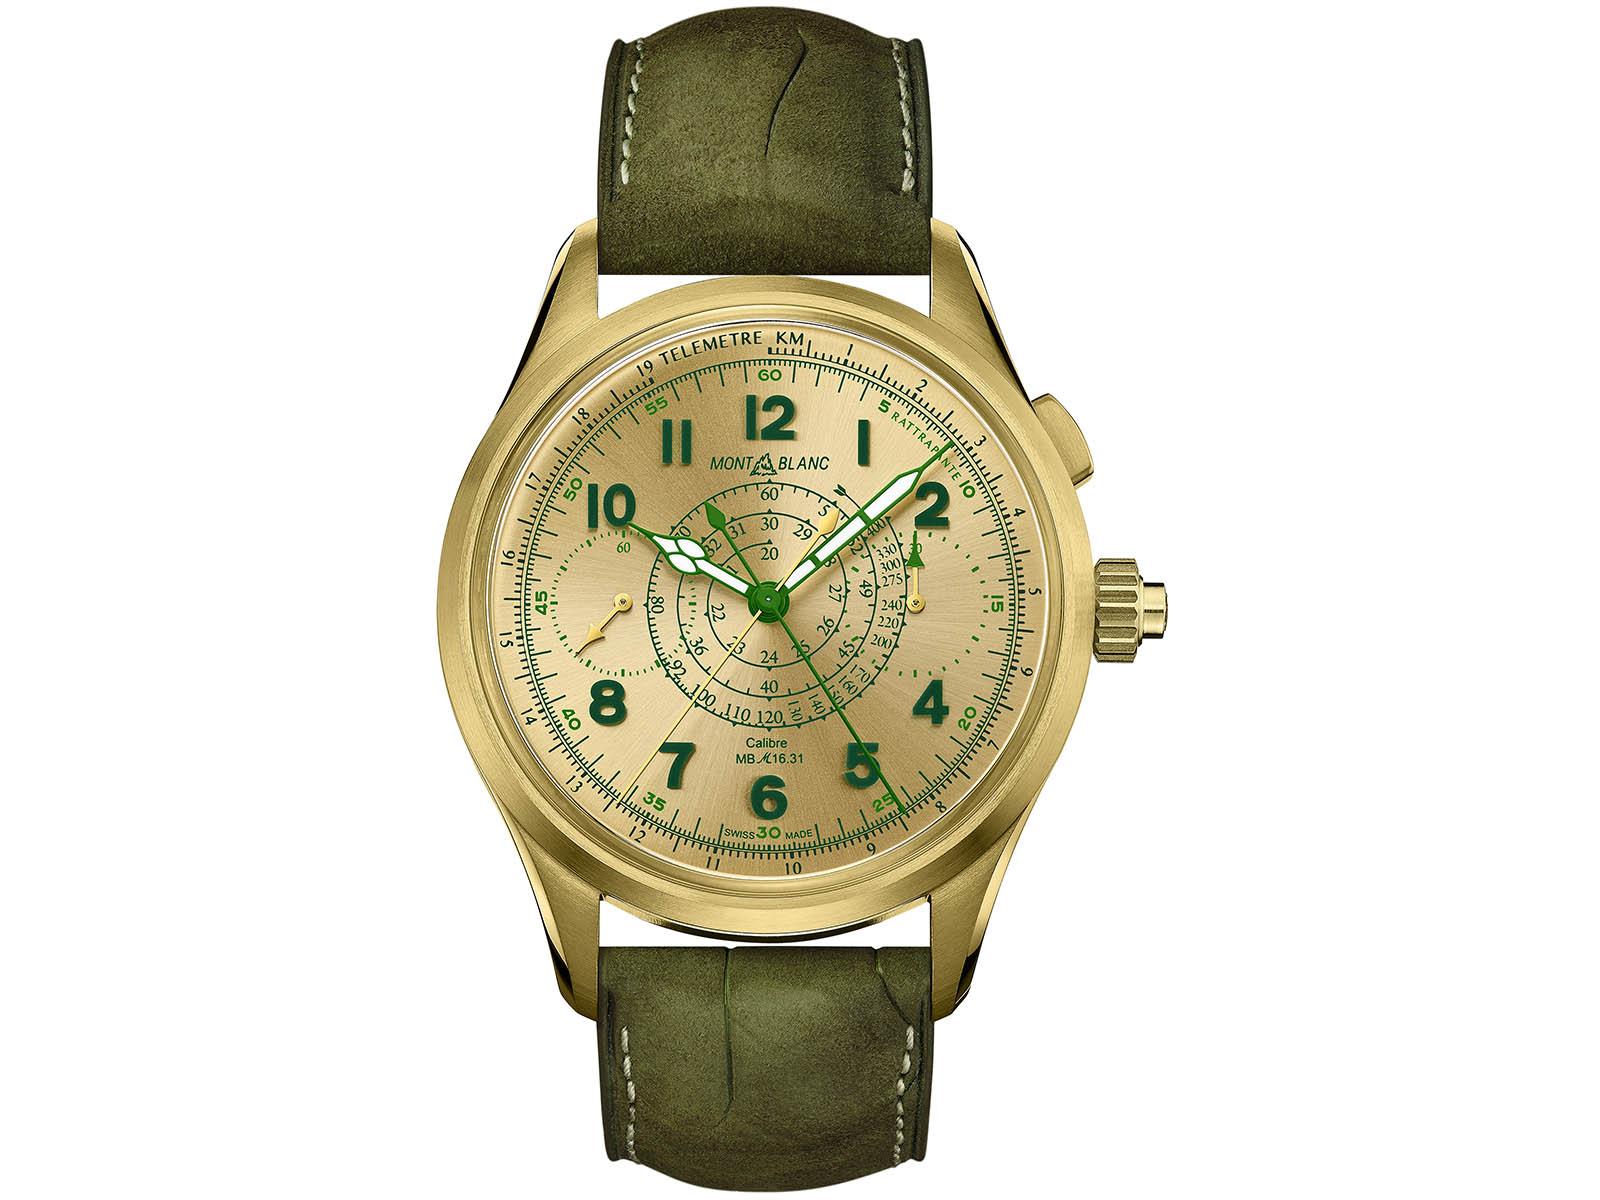 128085-montblanc-1858-split-second-chronograph-limited-edition-18-5.jpg